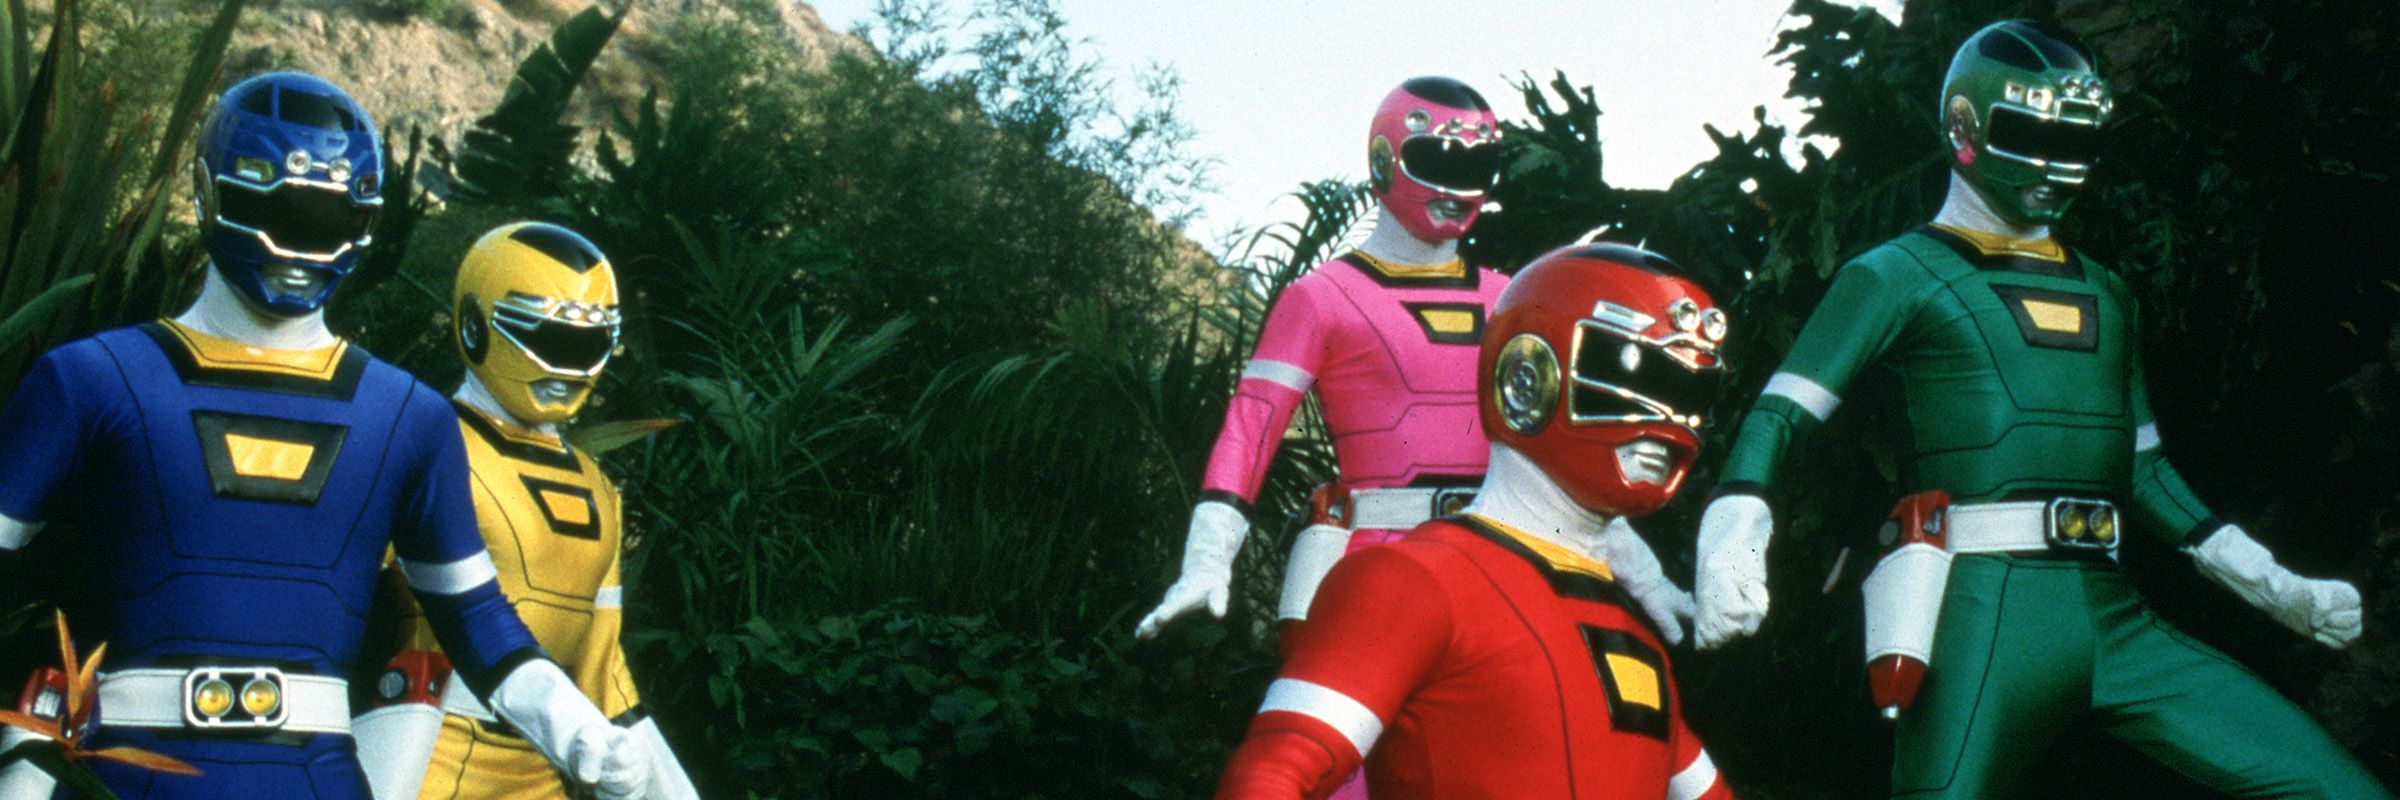 Power Rangers Turbo Film